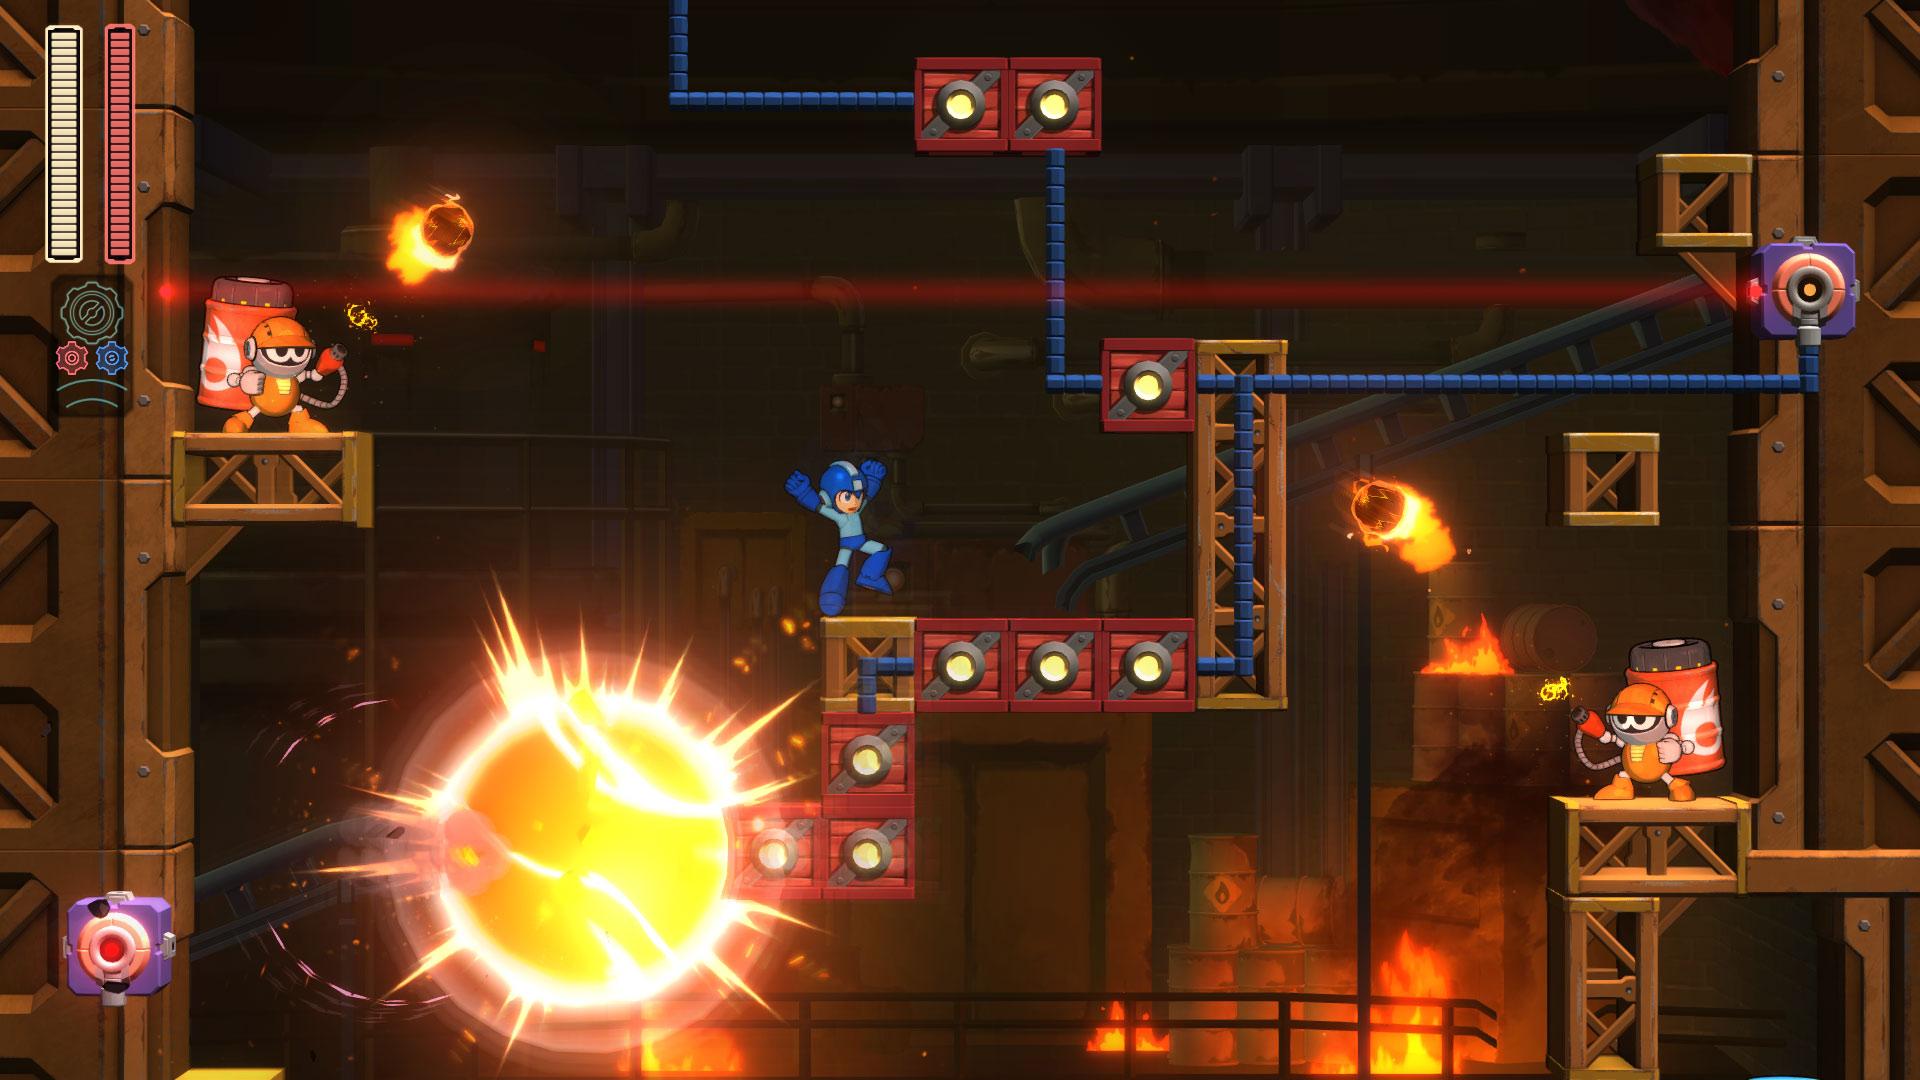 Mega Man 11 koeta tässä tasoloikata